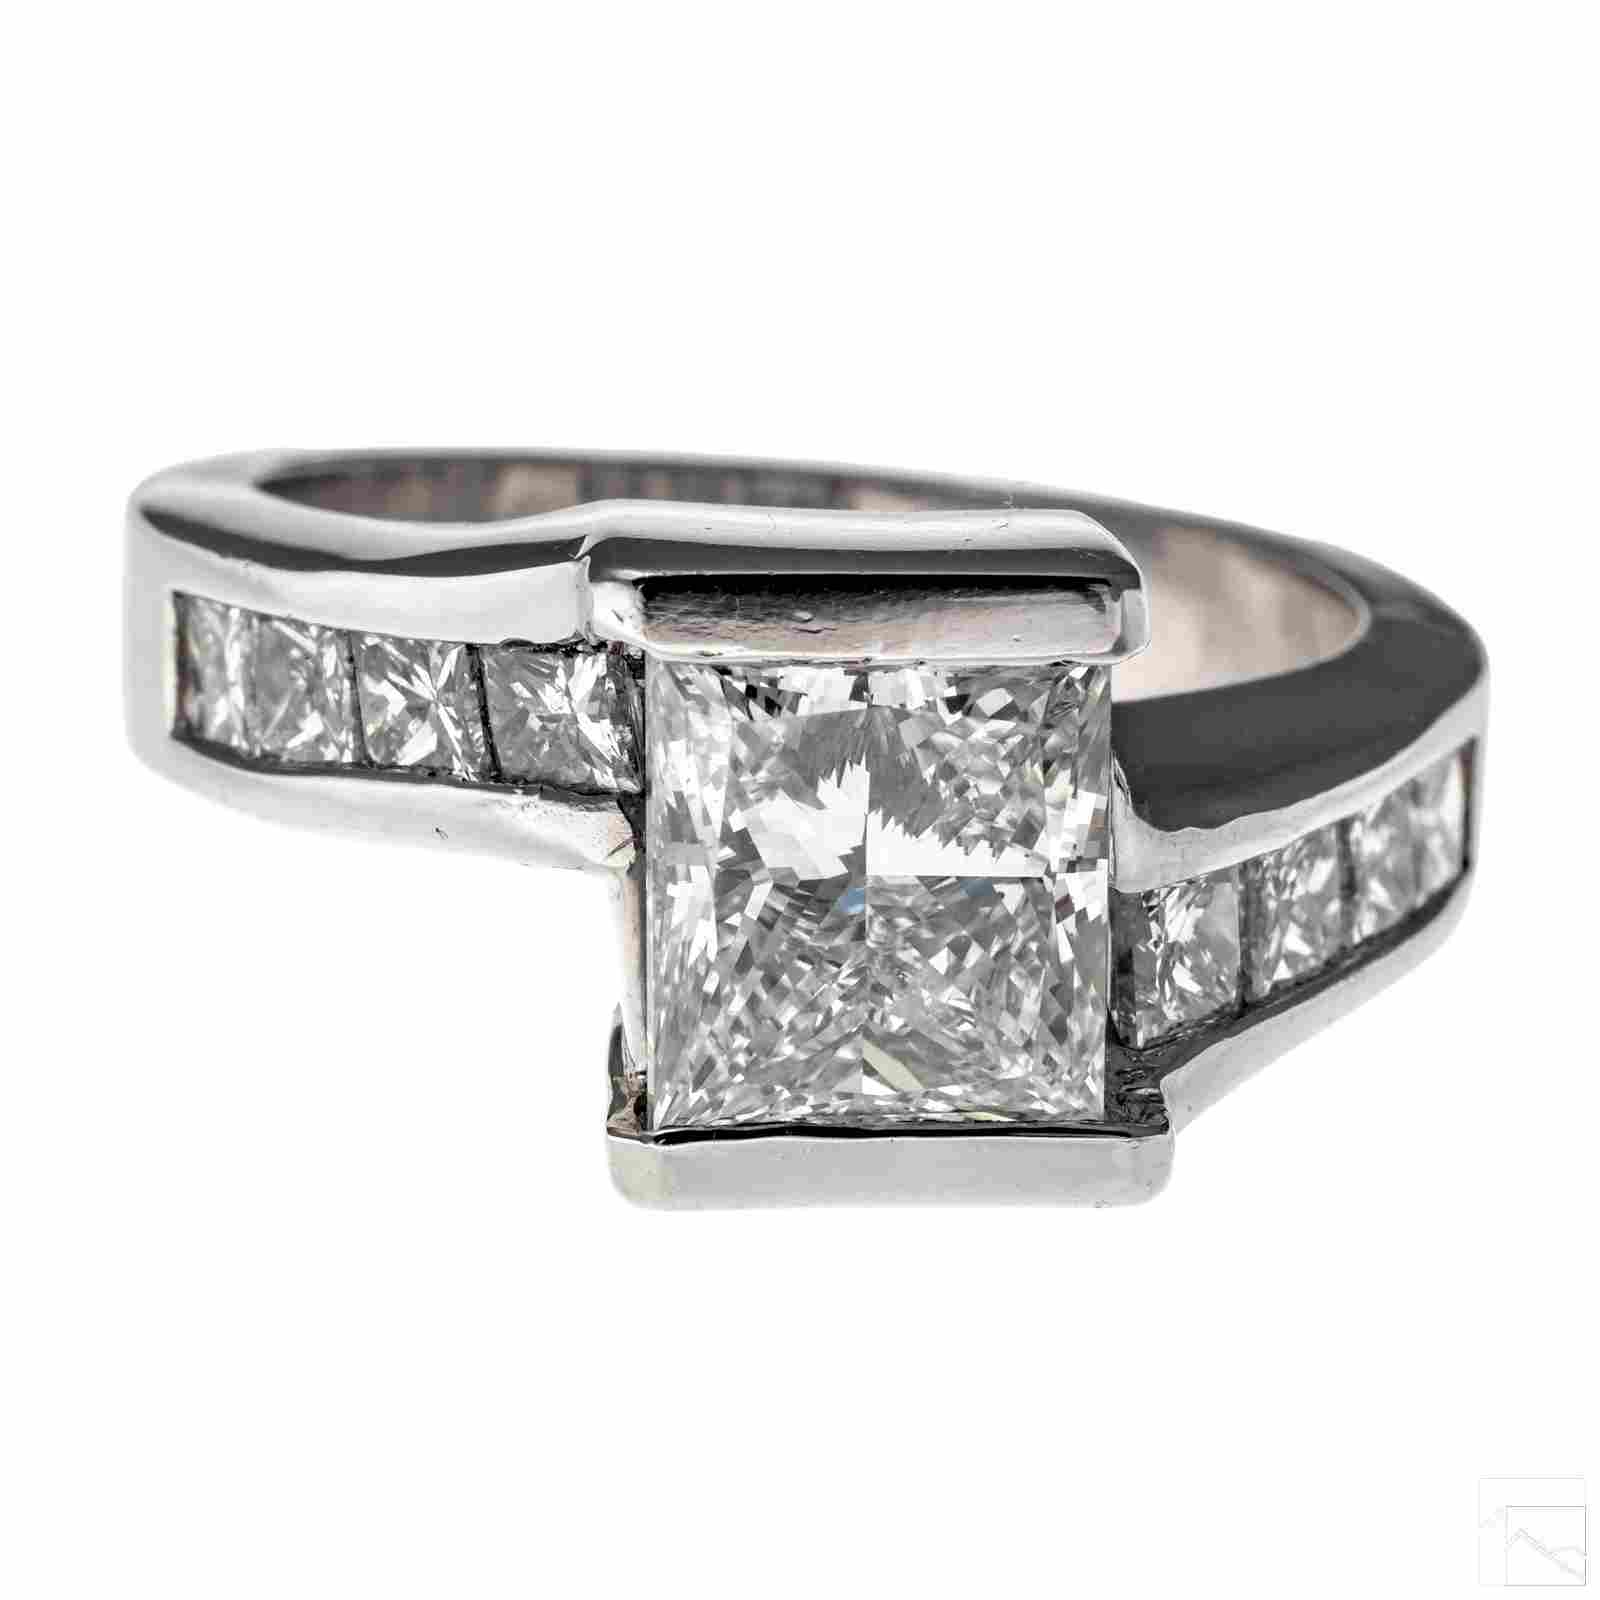 Diamond & Platinum 4.25 CTTW Ring 3 Ct G VS2 GIA